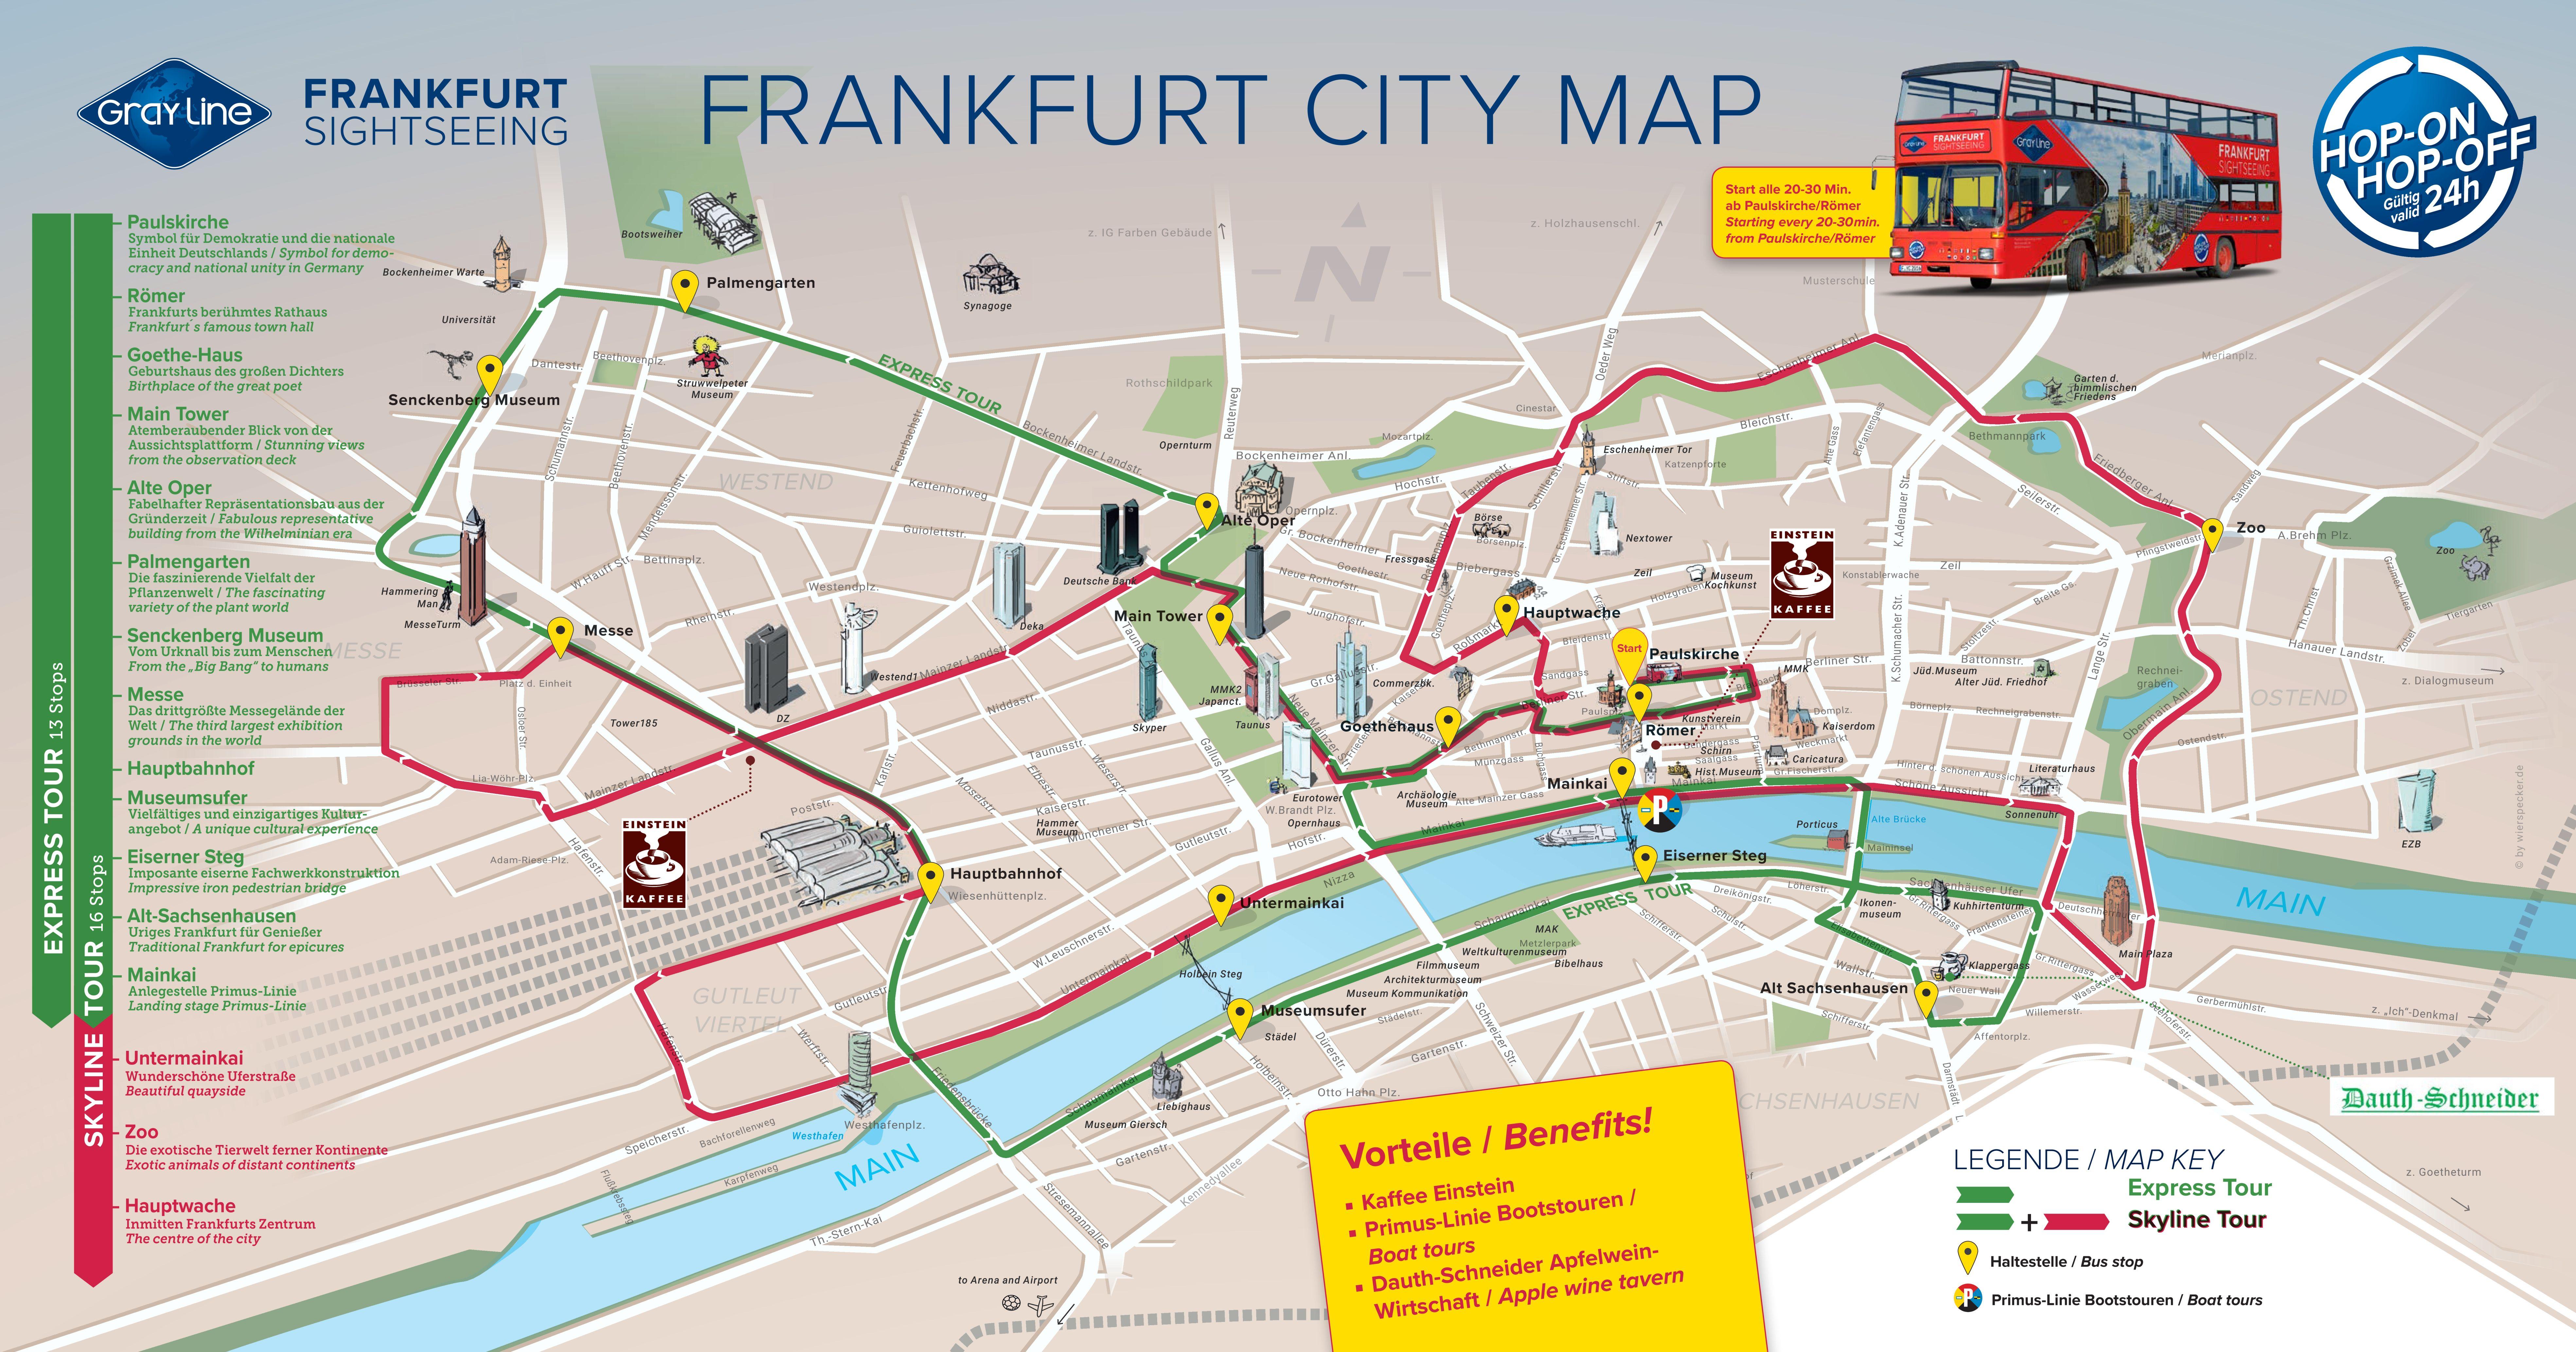 selectedde Frankfurt Sightseeing selectedde